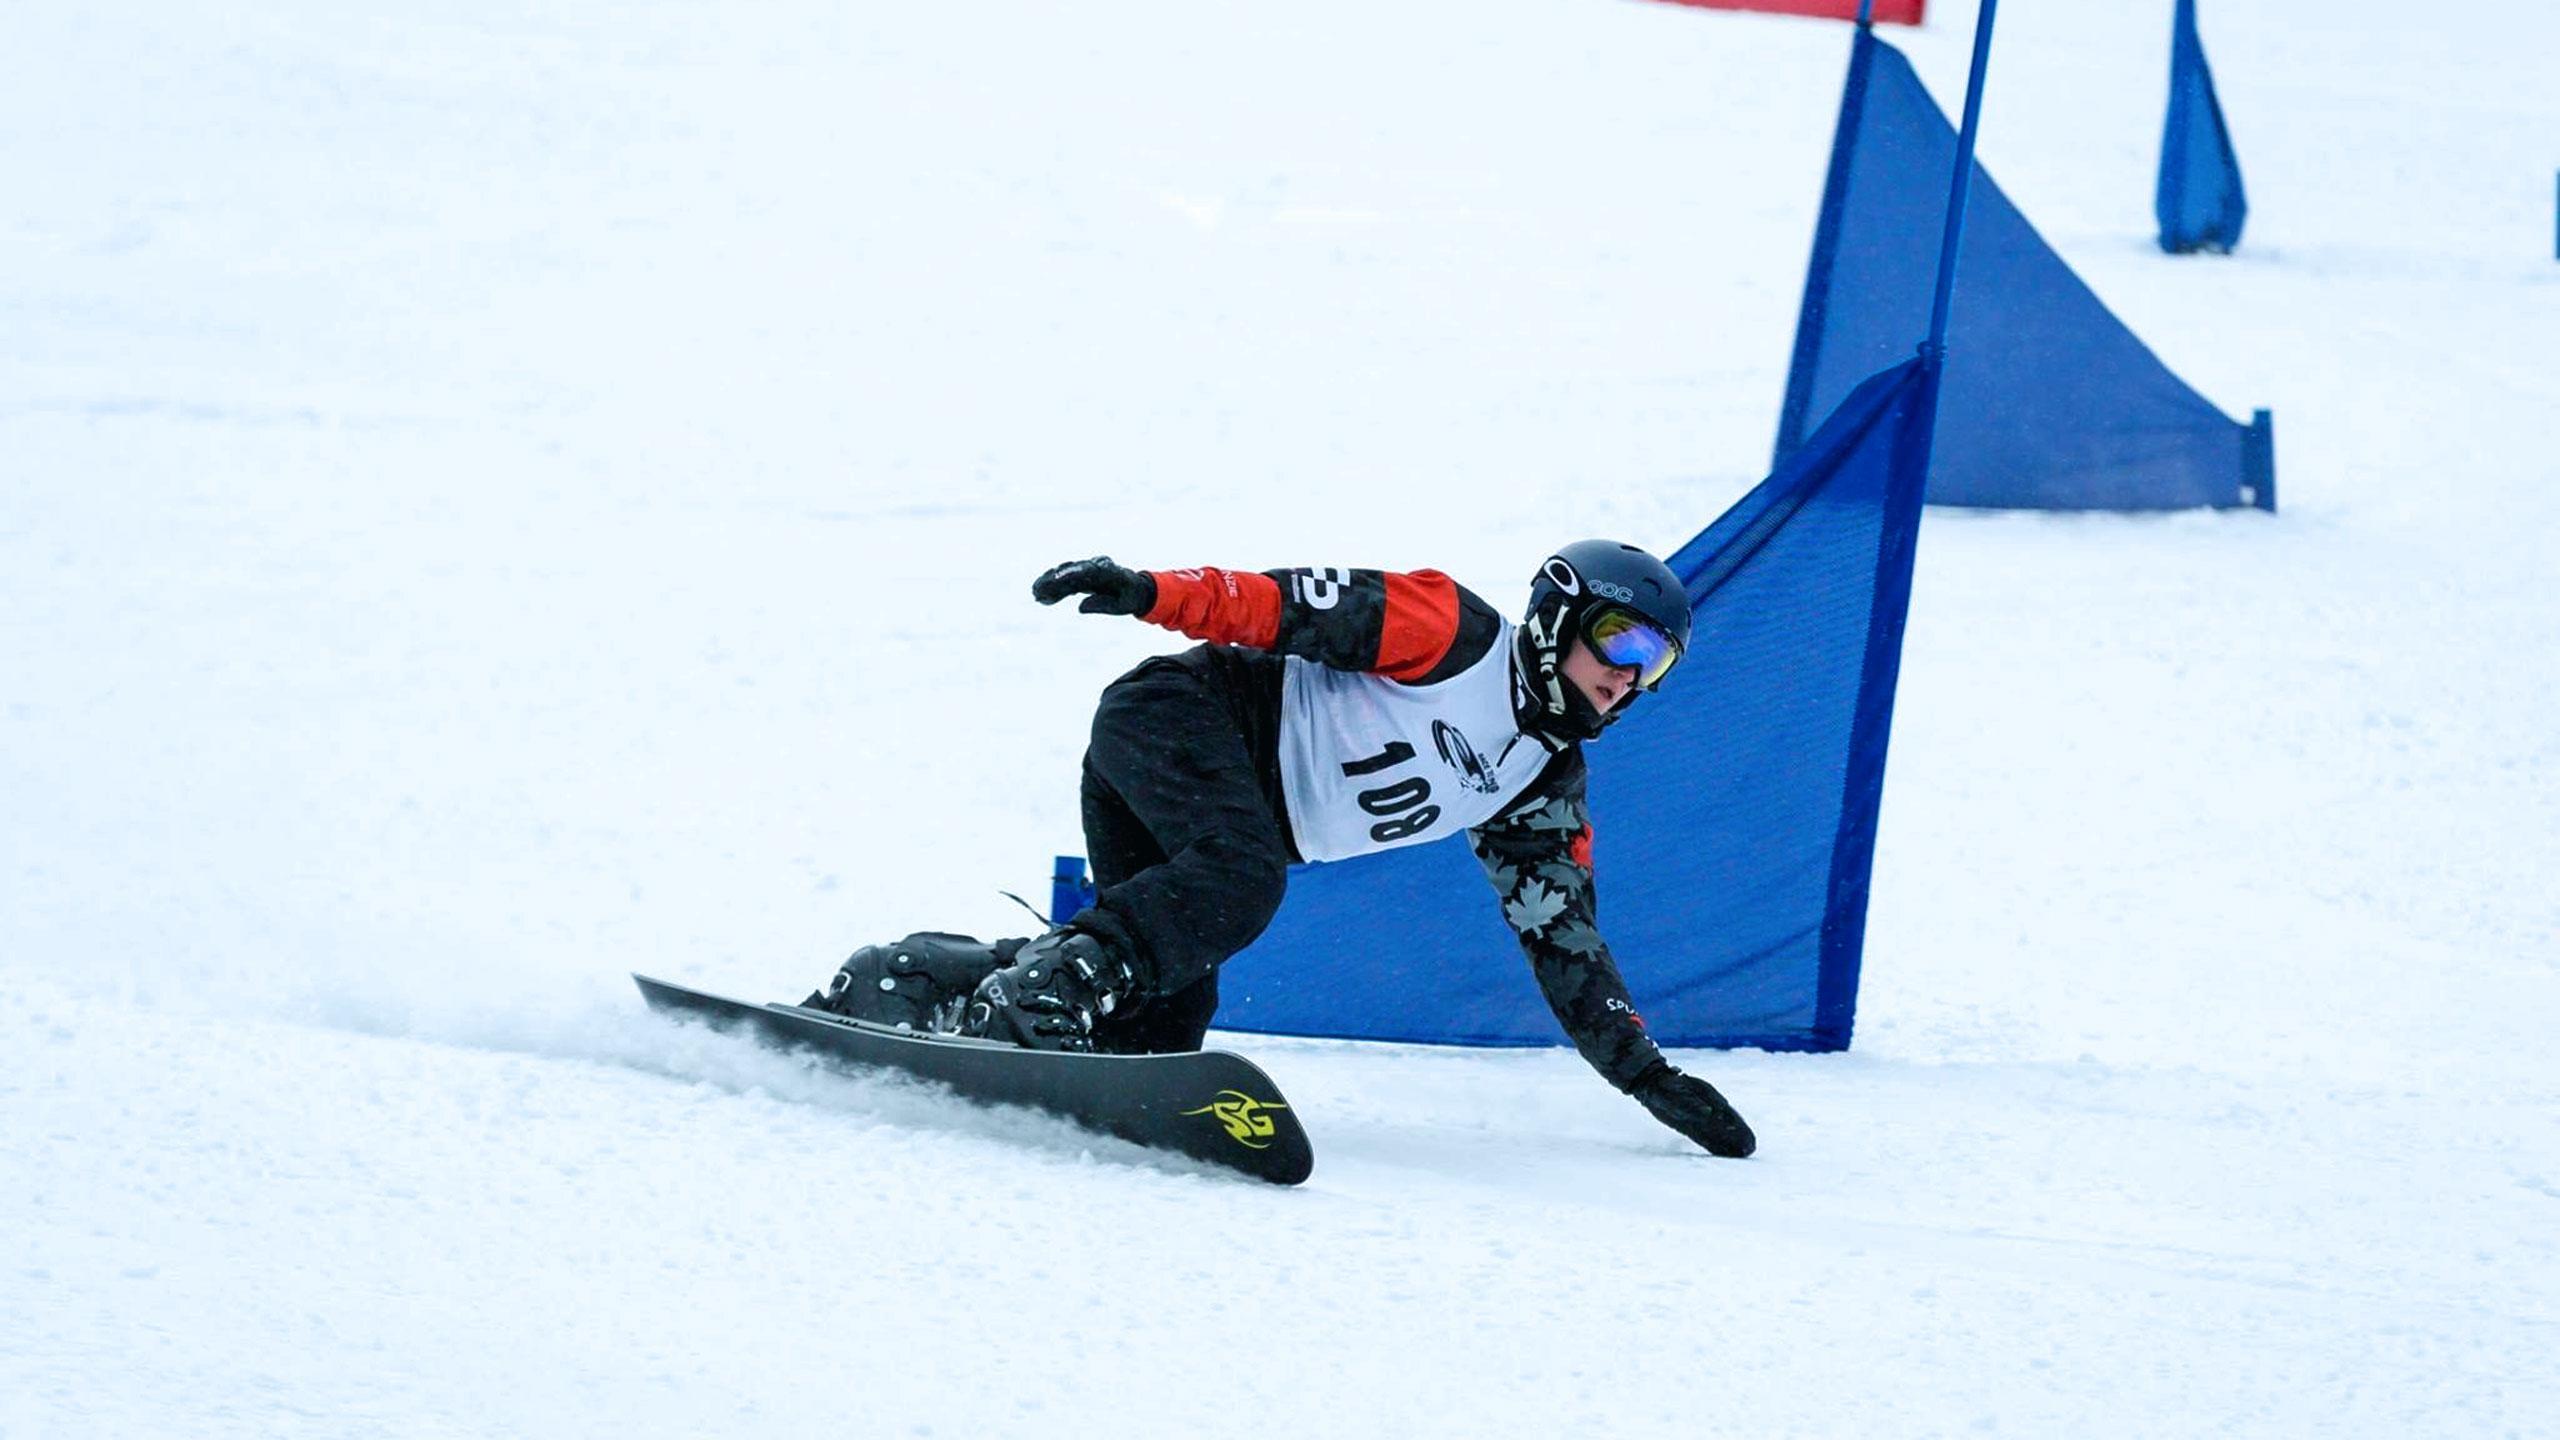 Jennifer Hawkrigg snowboards down a snowy hill